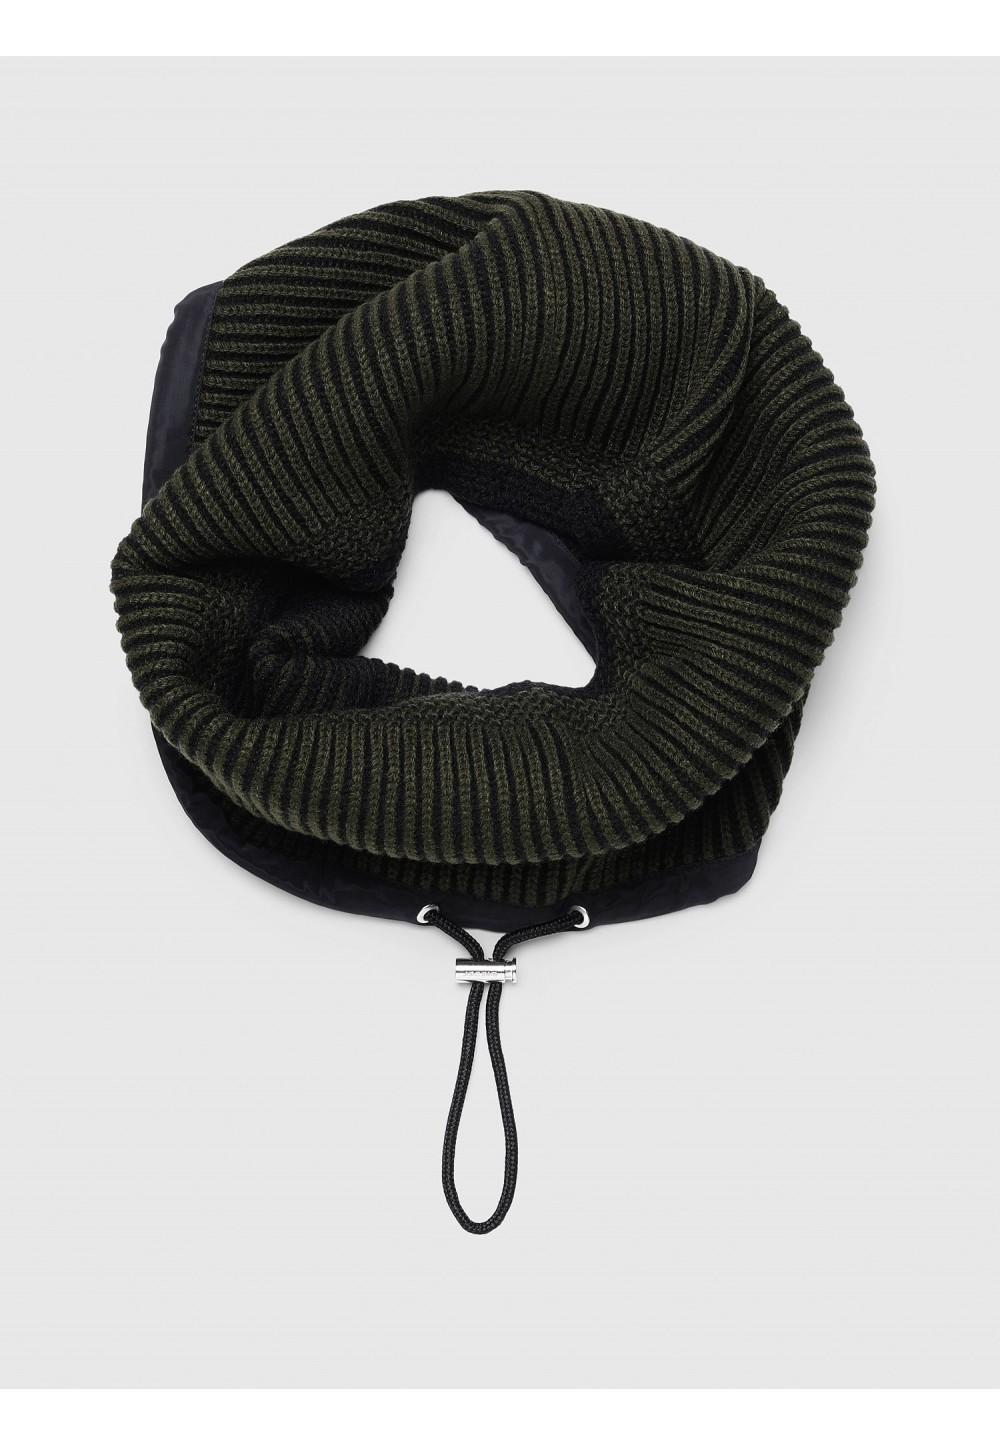 Вязаный снуд с завязкой